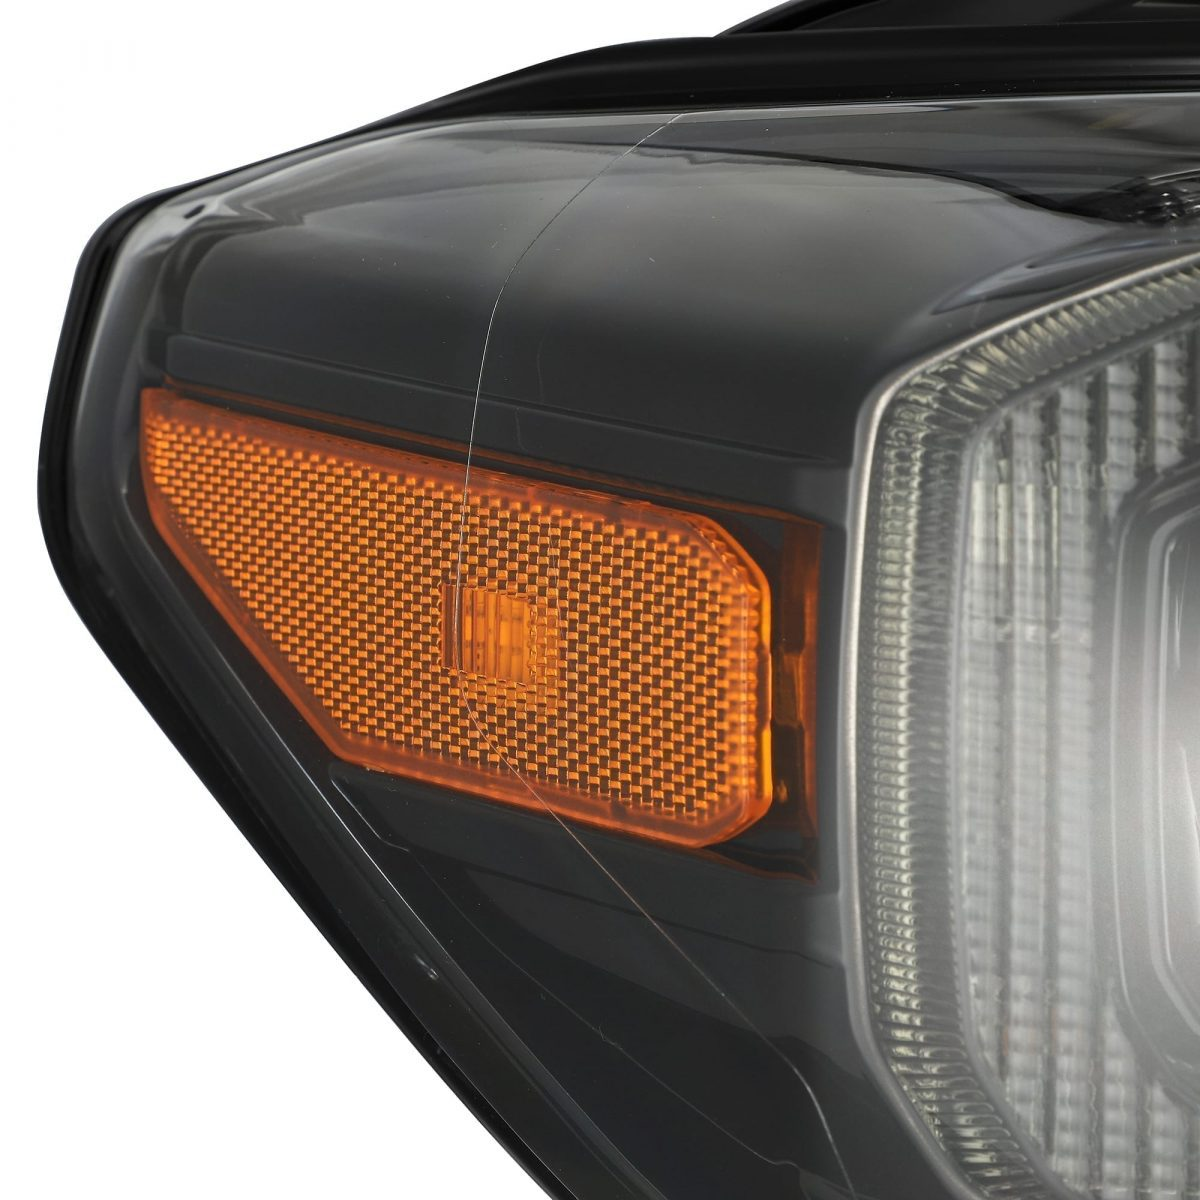 2016 2017 2018 2019 2020 Toyota Tacoma NOVA-Series Full LED Projector Headlights Midnight Black